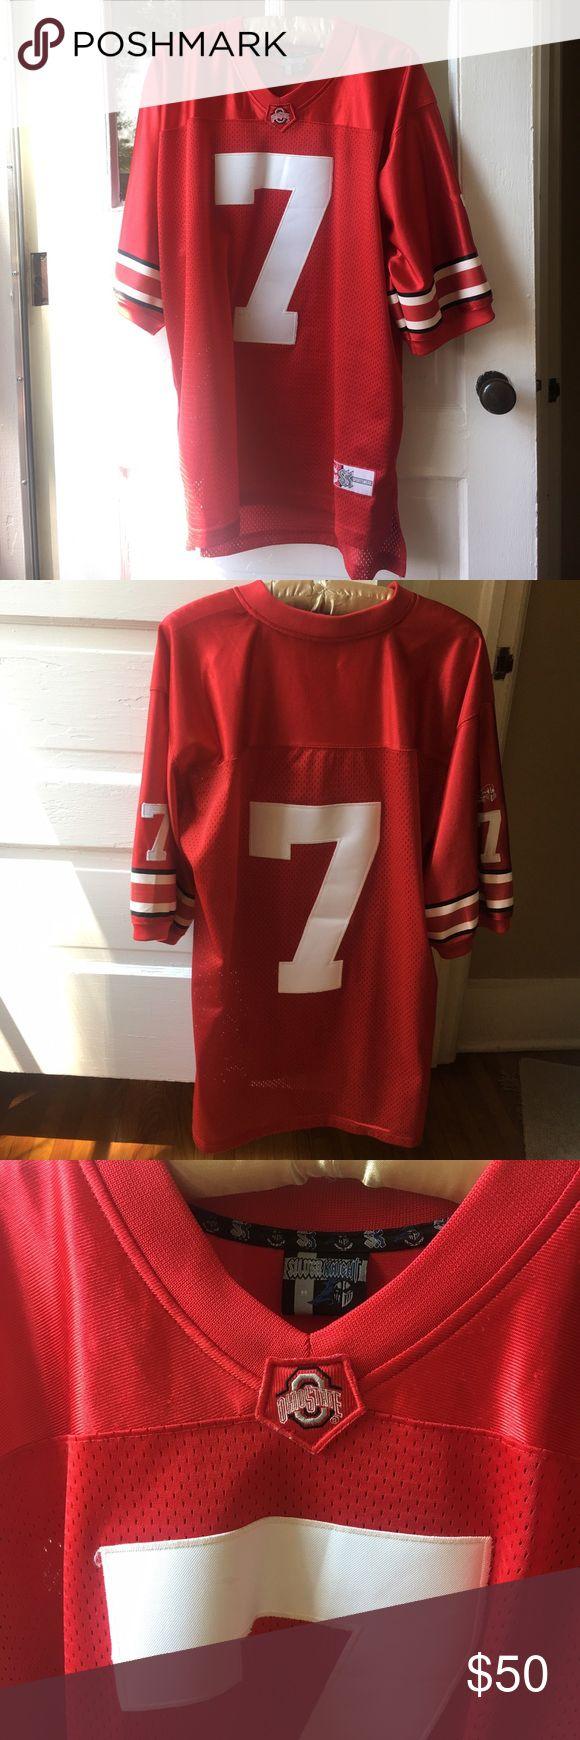 Ohio State Football Jersey #7 Ohio State Football Jersey #7. Size M.  Unisex. Silver Knight Sportswear. In great condition! Silver Knight Sportswear Tops Tees - Long Sleeve